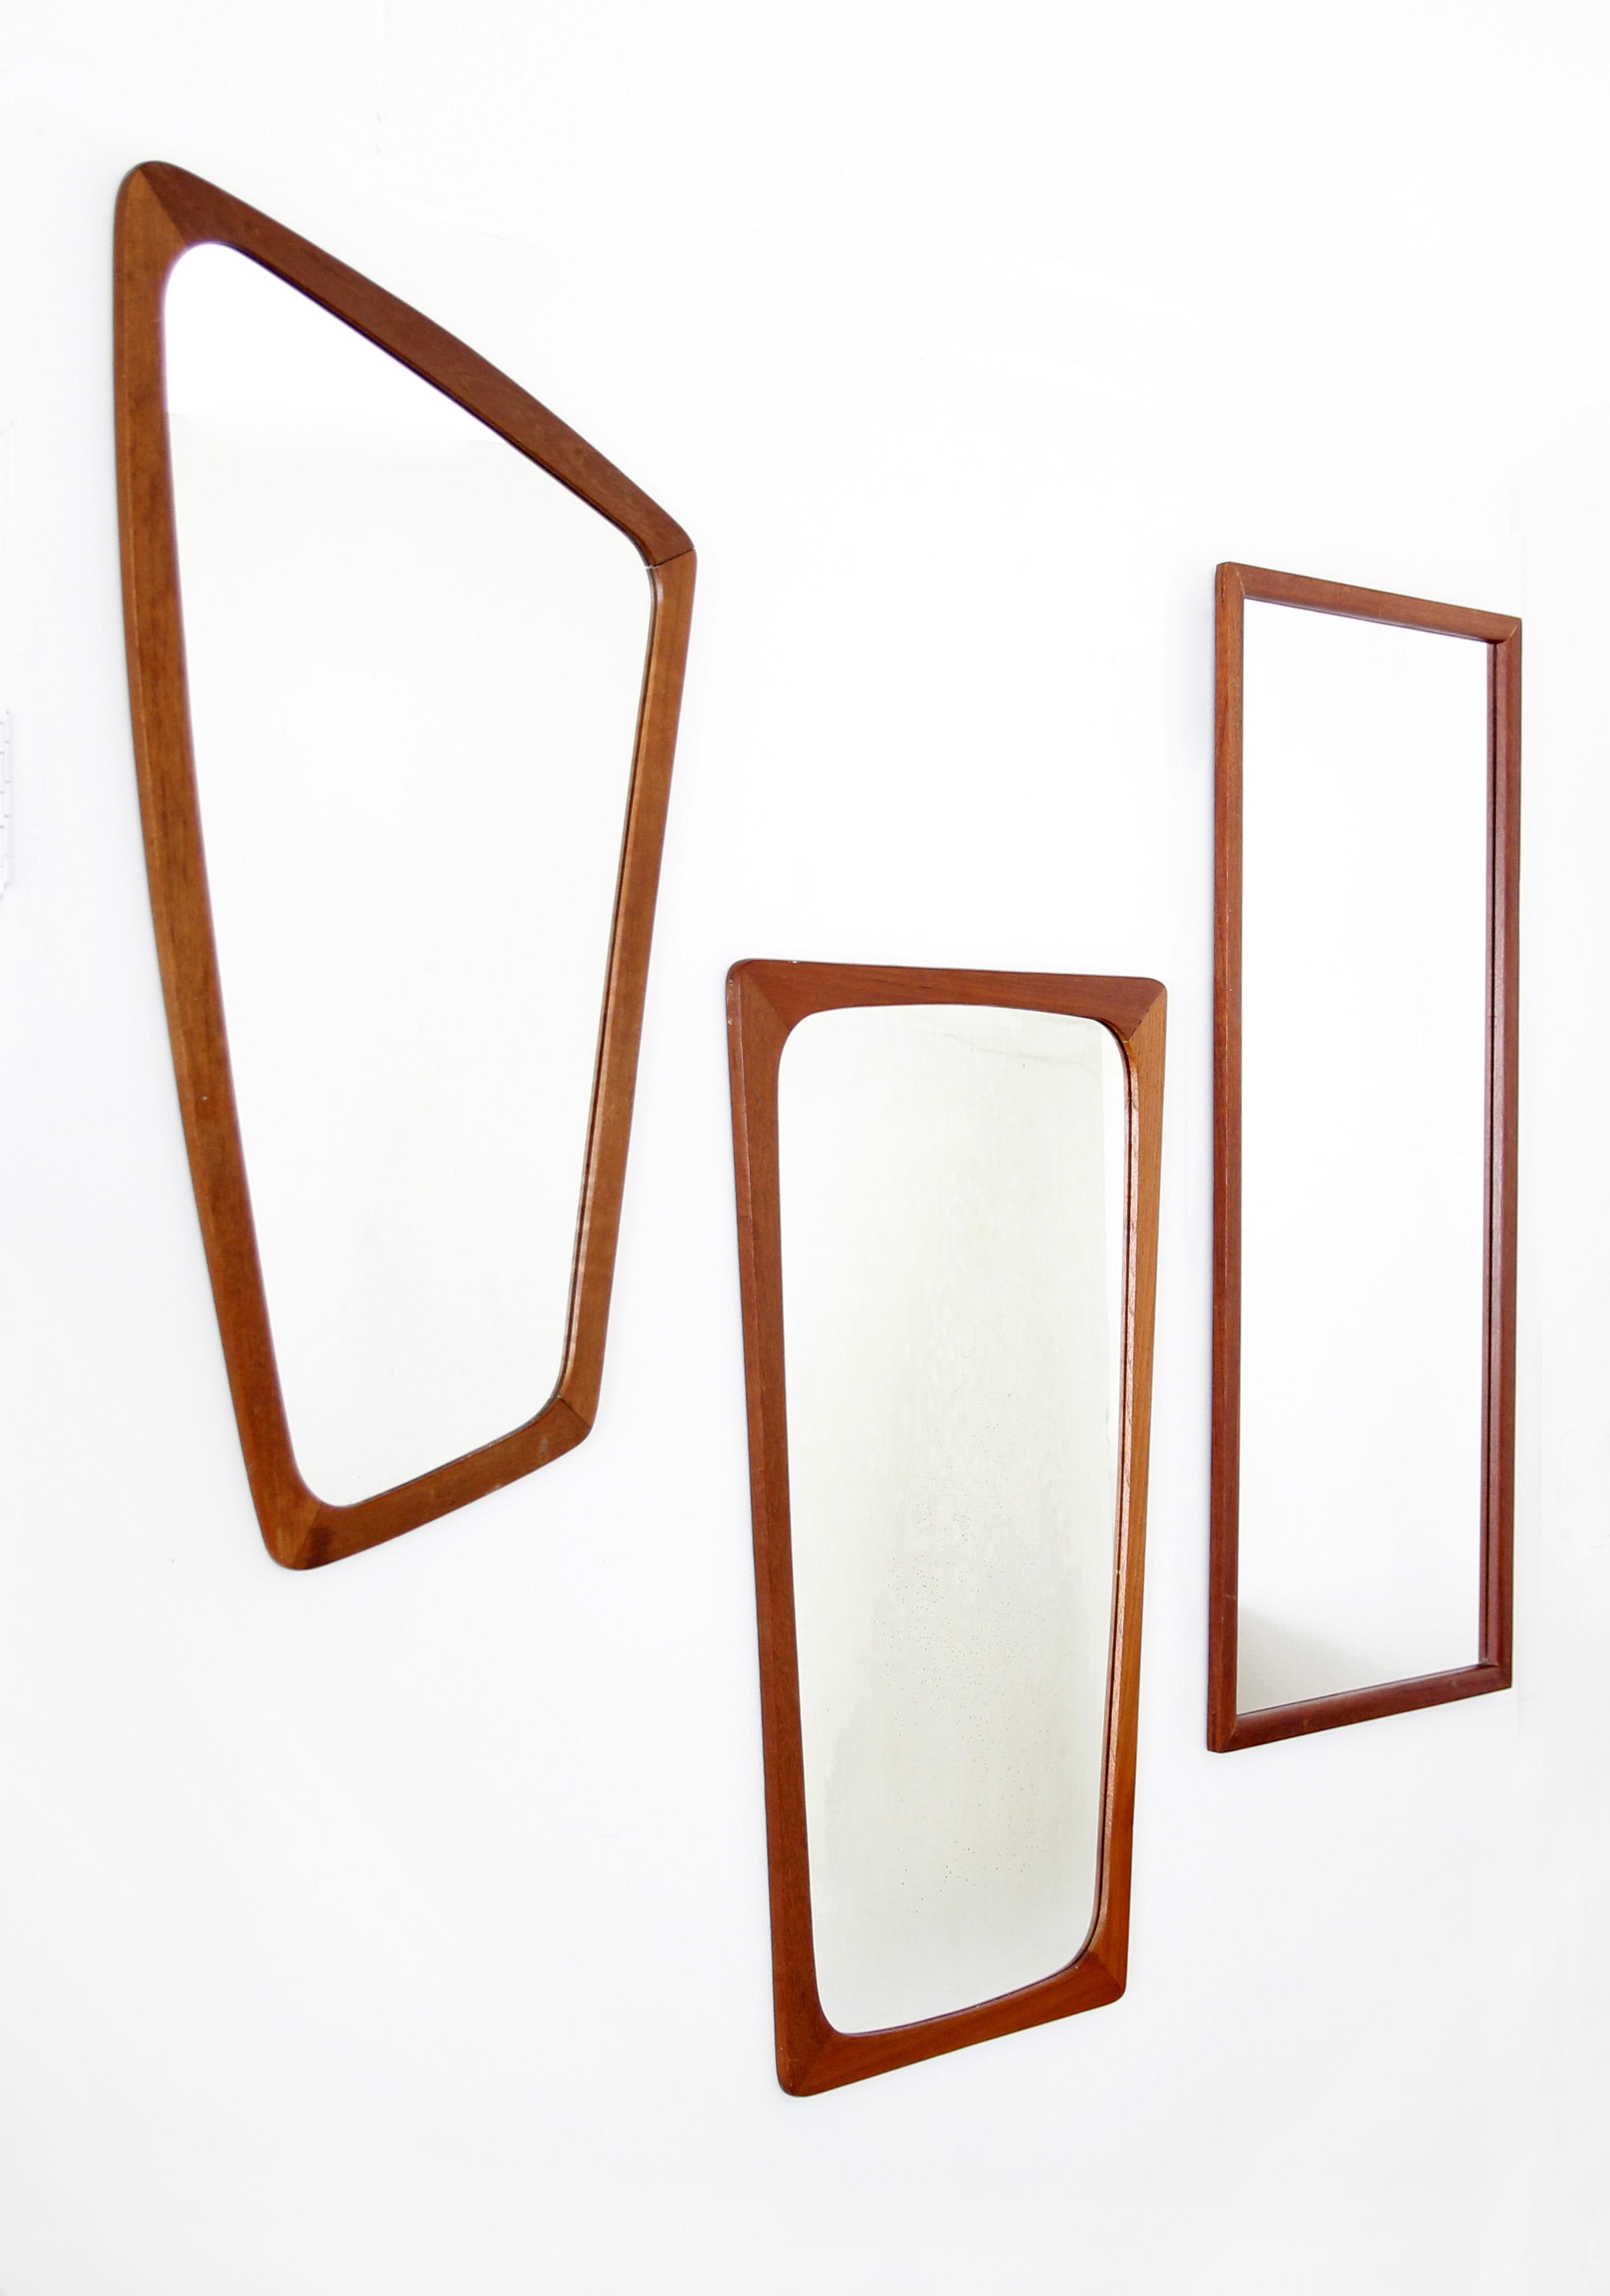 vintage teakhouten design spiegel denemarken van ons. Black Bedroom Furniture Sets. Home Design Ideas